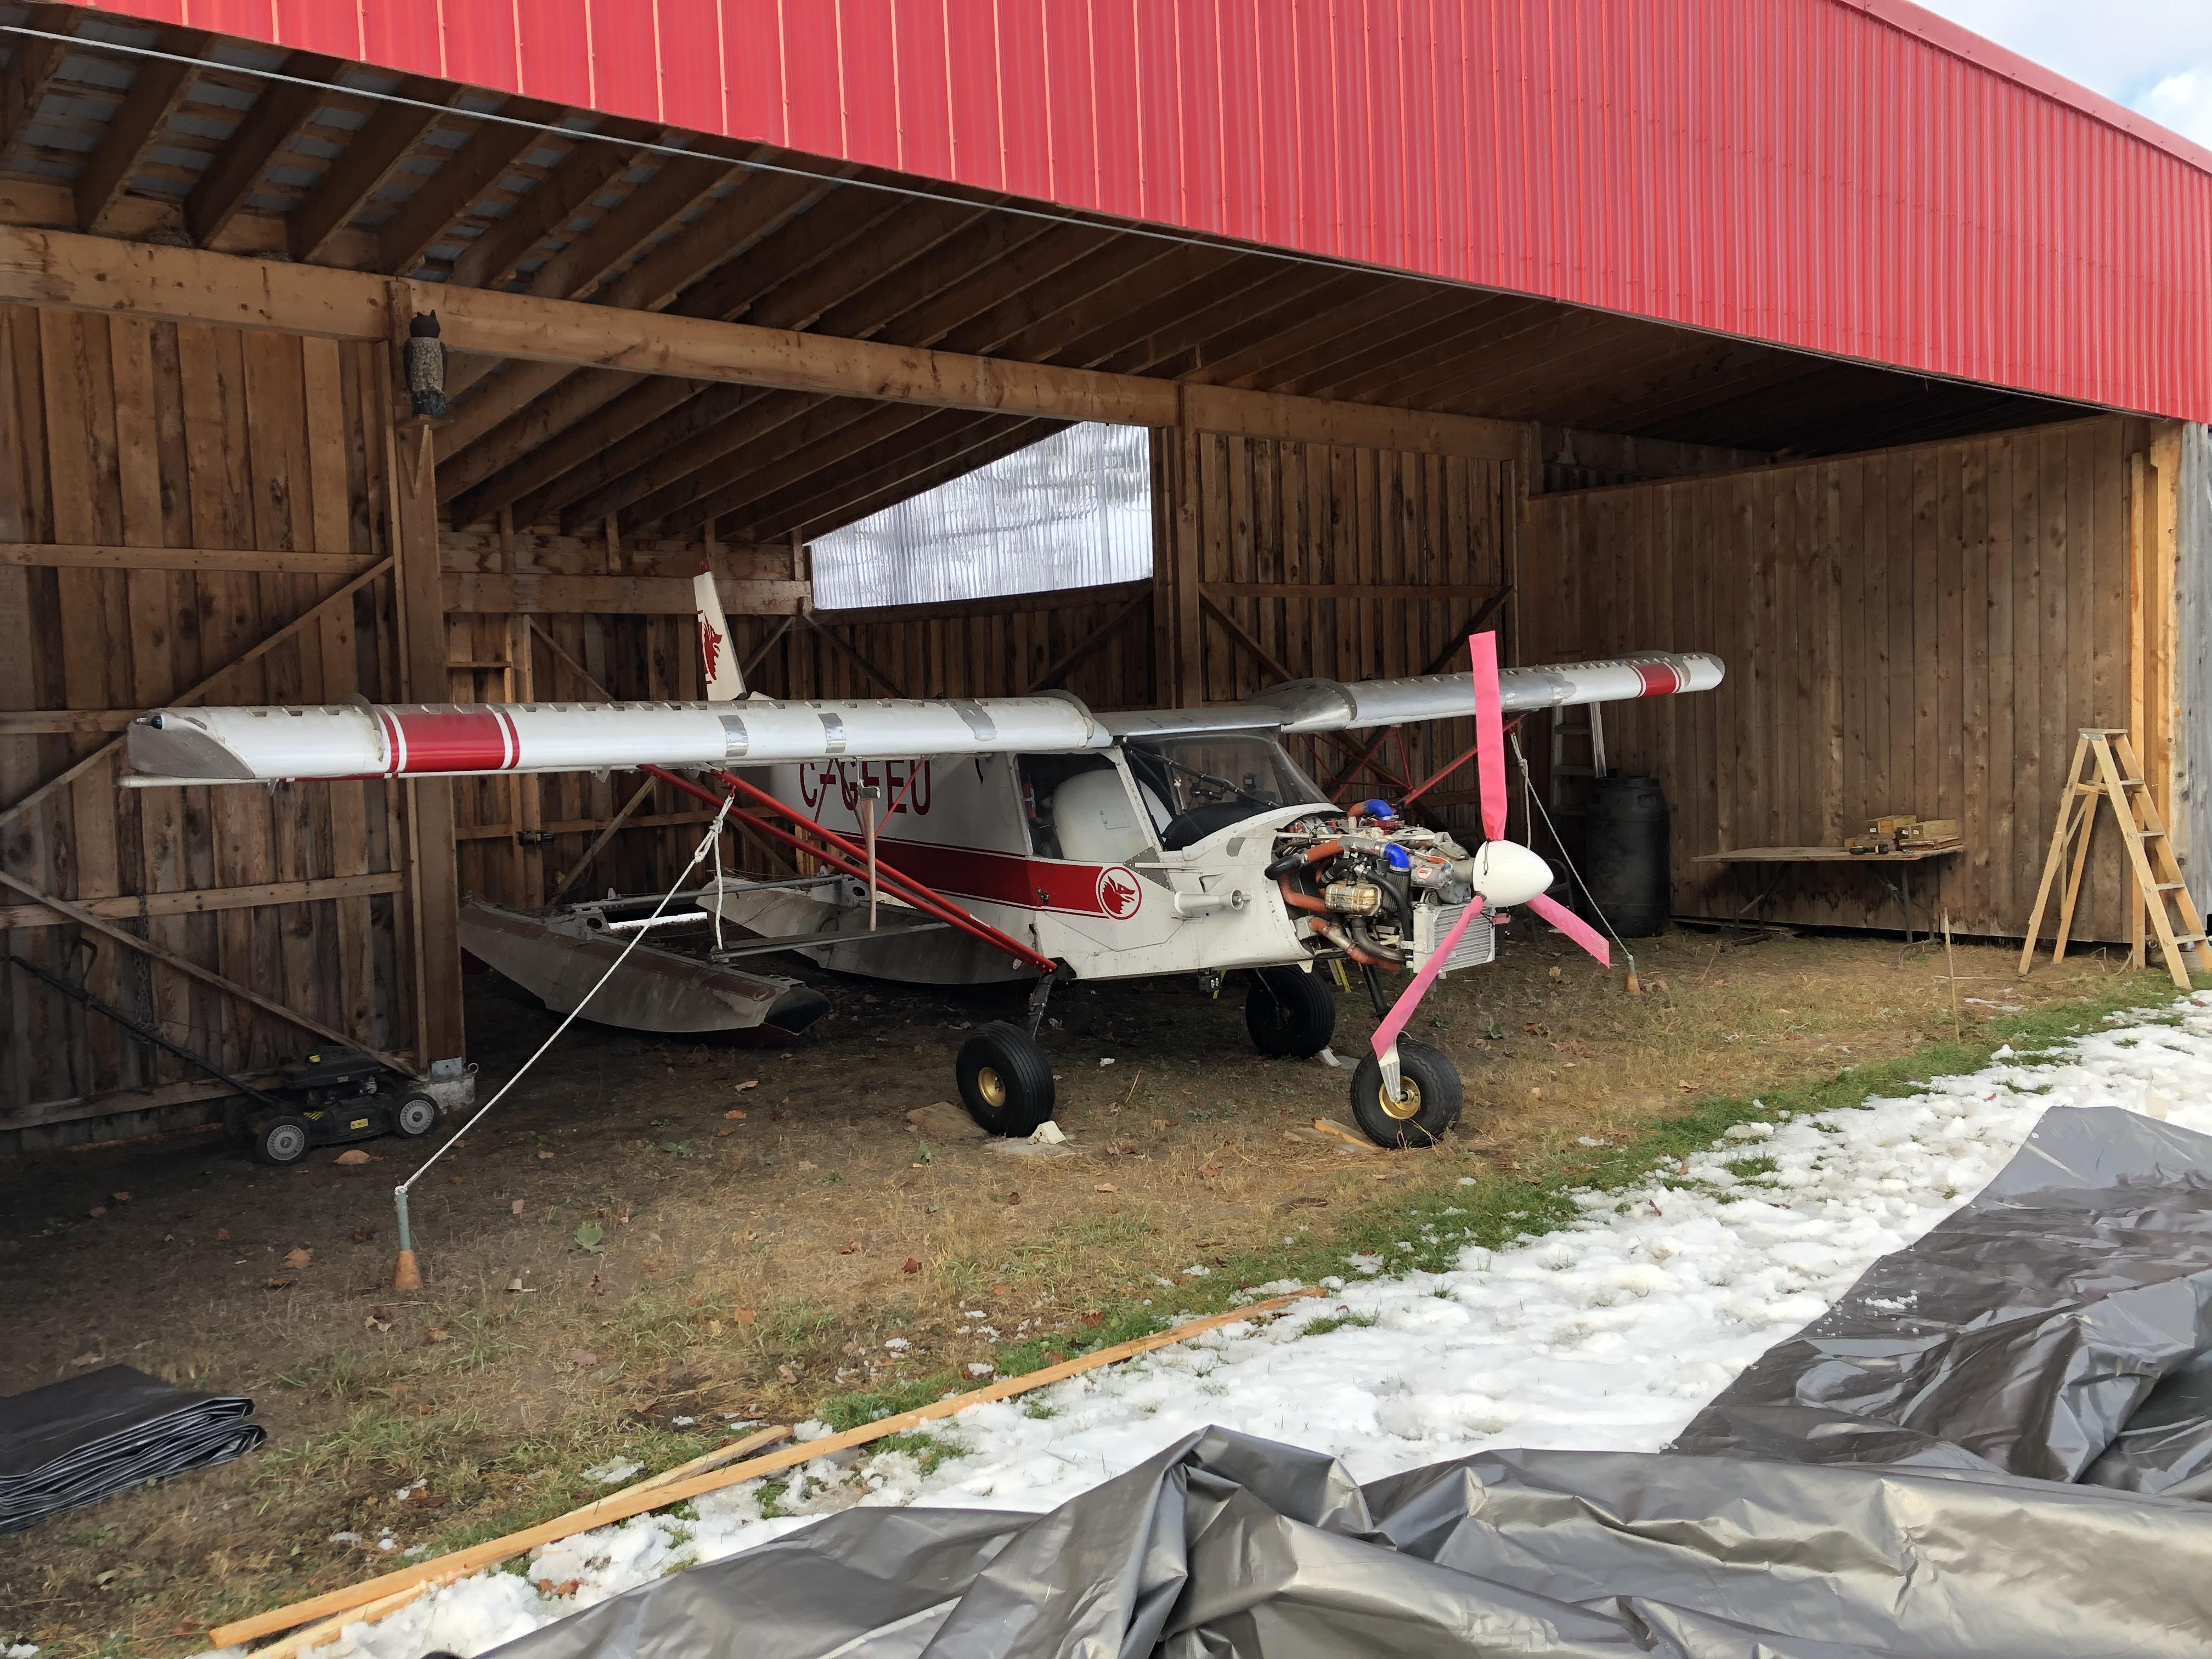 Ch701 hangar getting new Tempo doors